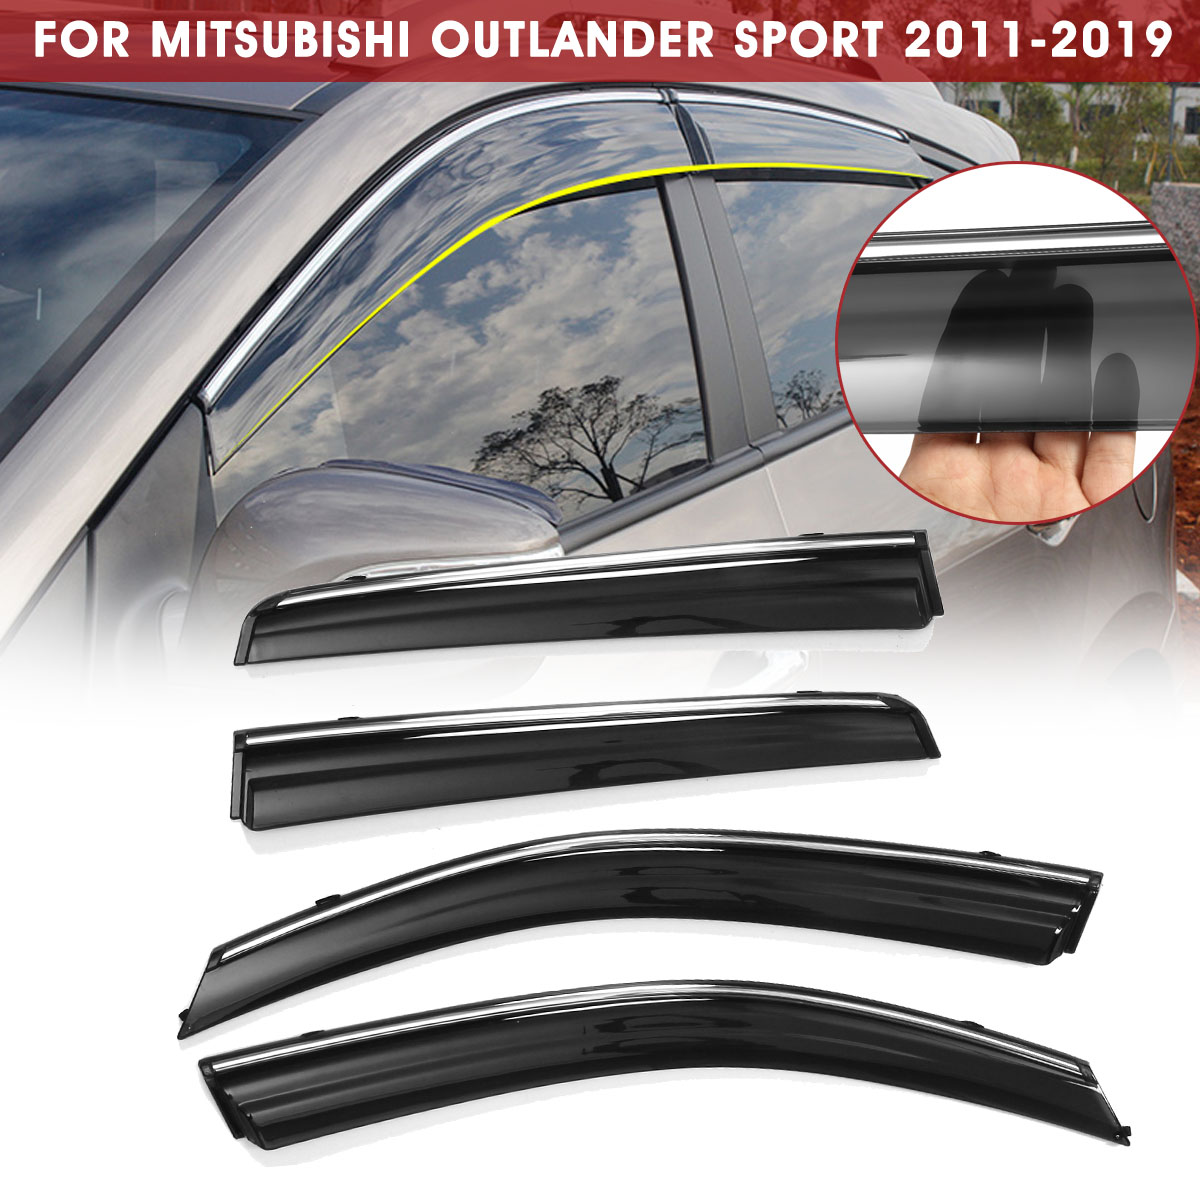 4pcs Out-Channel Visor Rain Guards For Mitsubishi Outlander 2016-2018